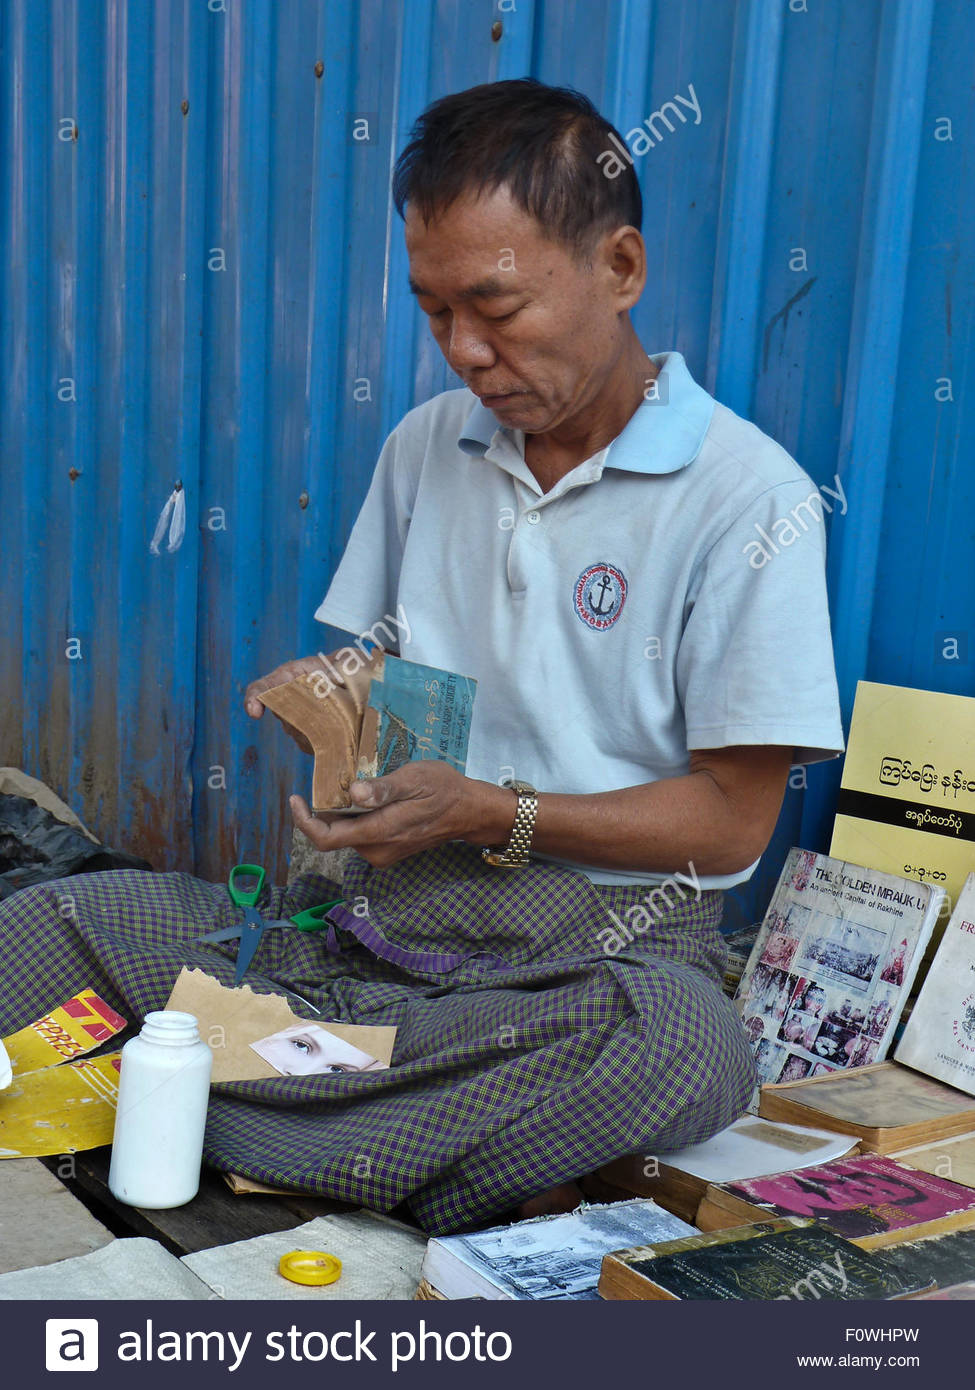 A street bookseller in Yangon, Myanmar (Burma) repairs a paperback while minding his display. Unlike neighboring - Stock Image